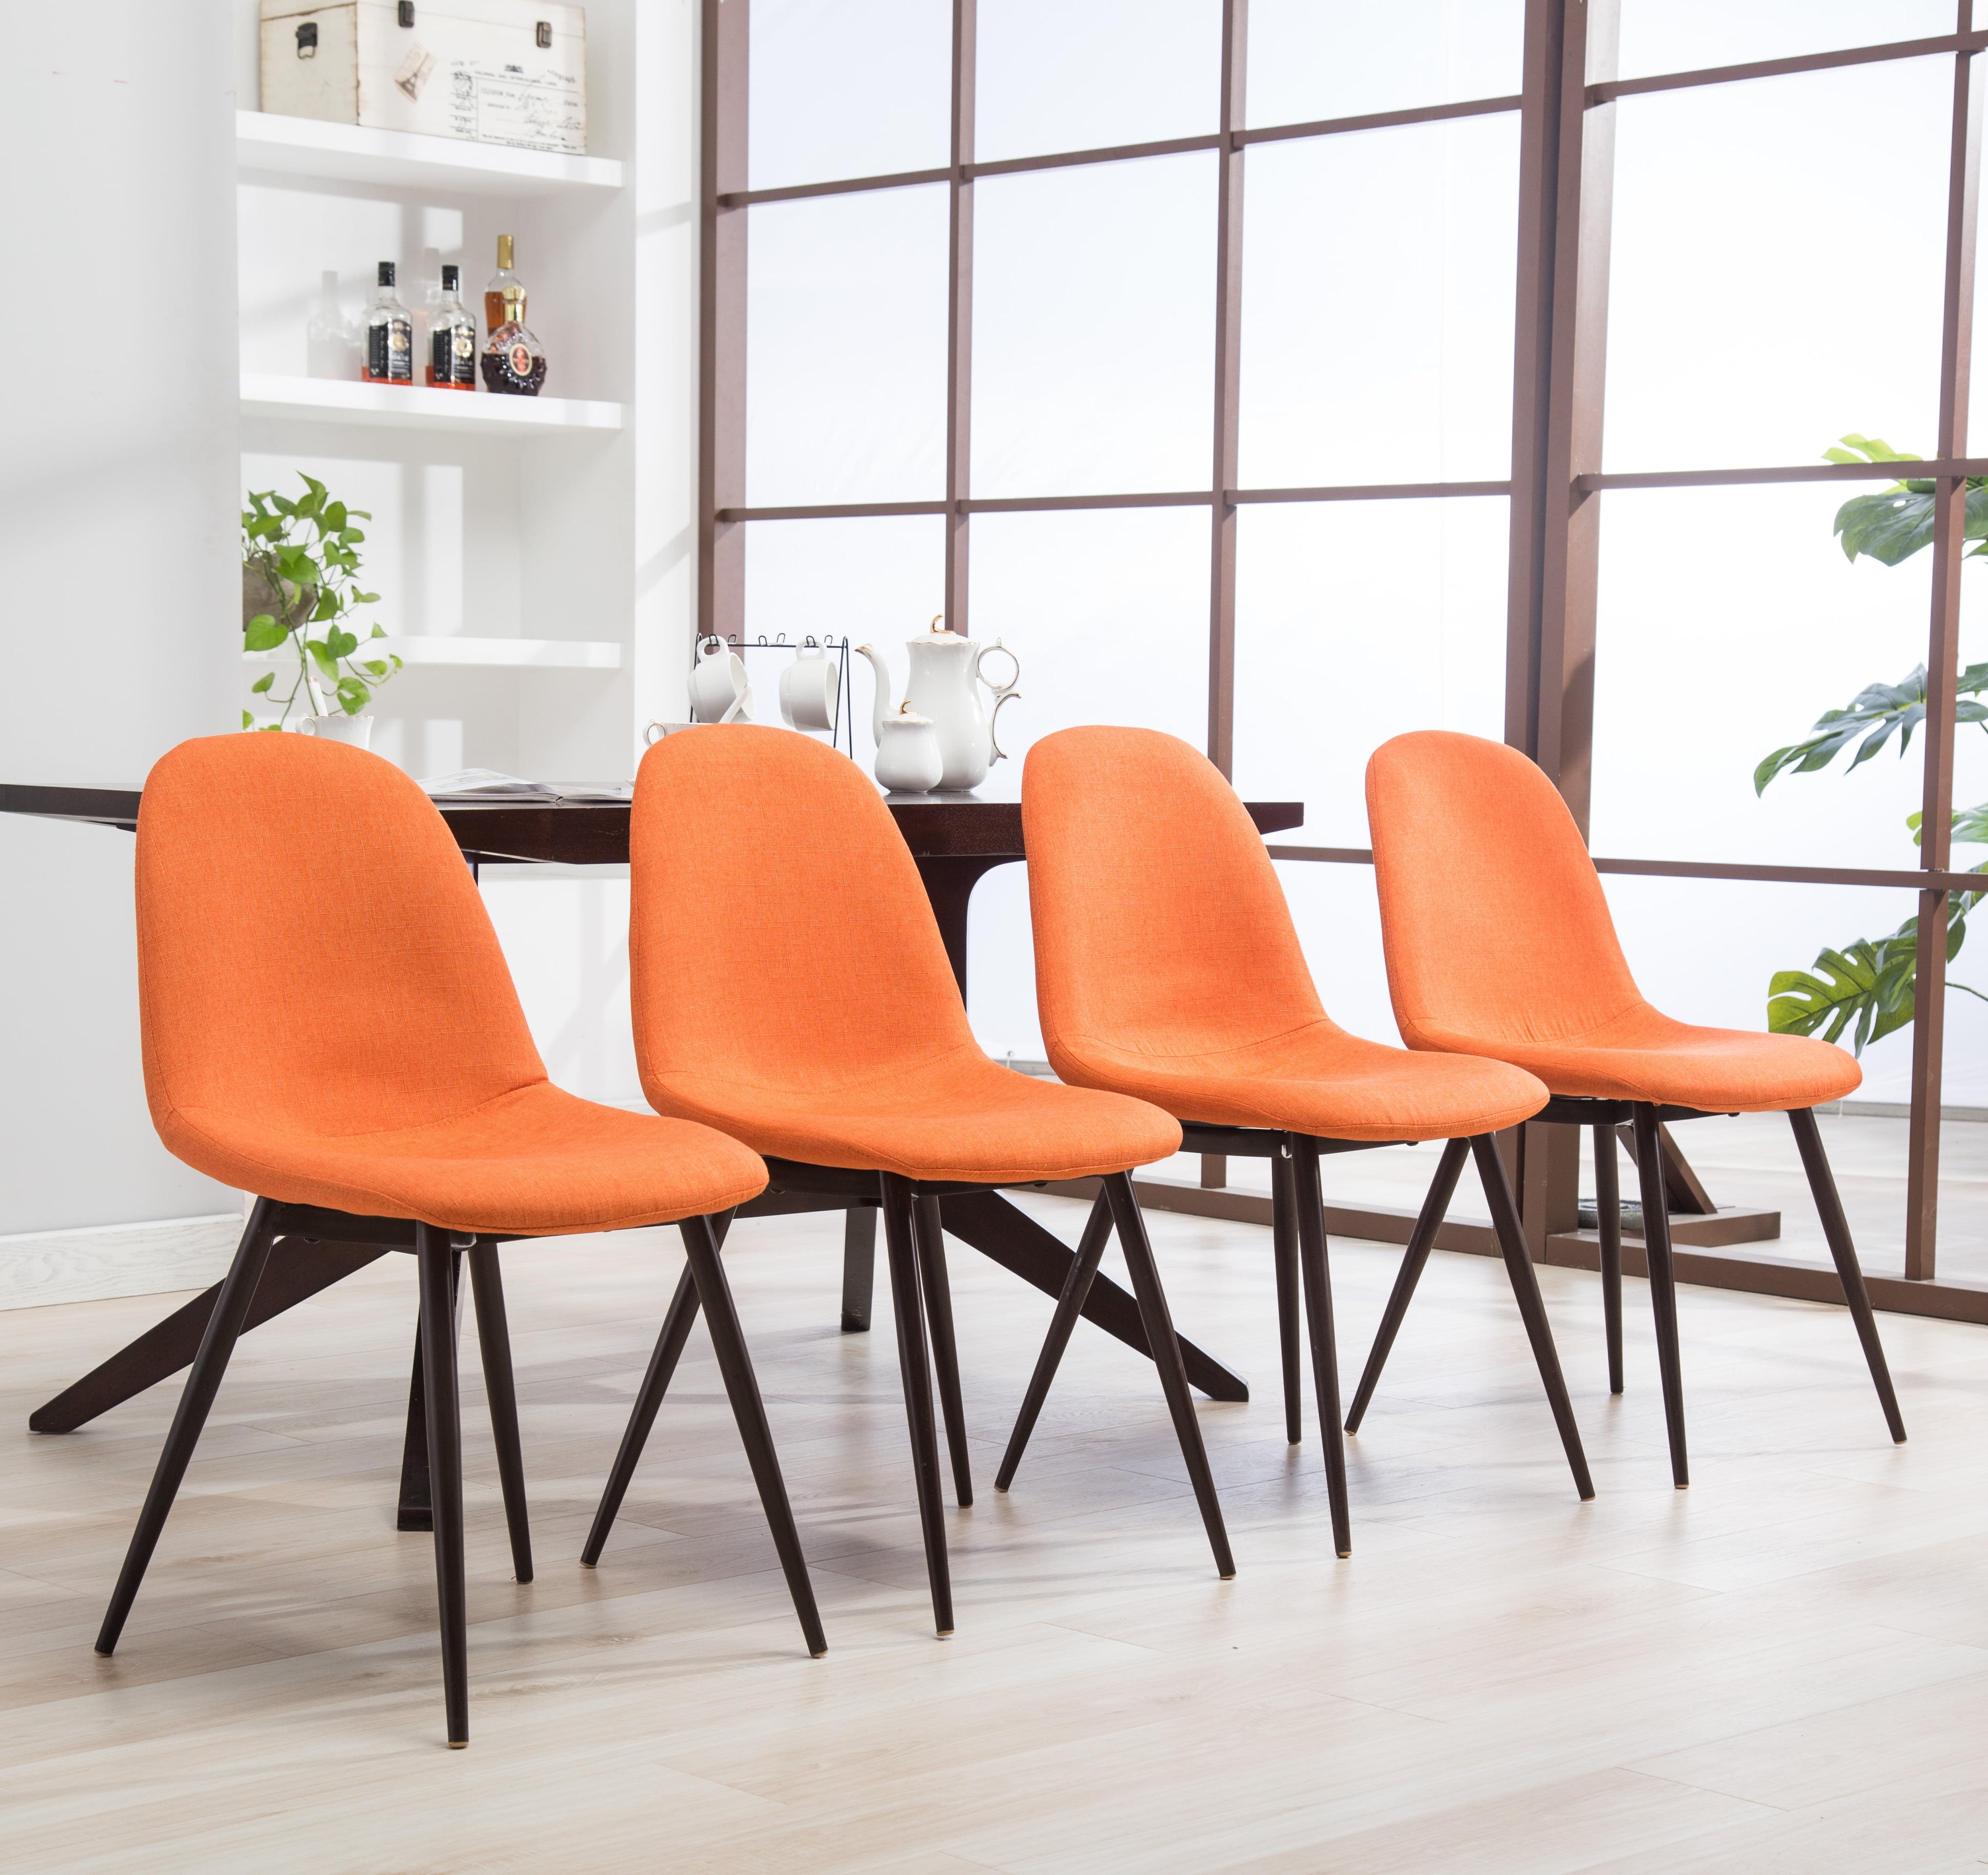 Roundhill Lassan Modern Contemporary Orange Fabric Dining Chairs, Set Of 4    Walmart.com